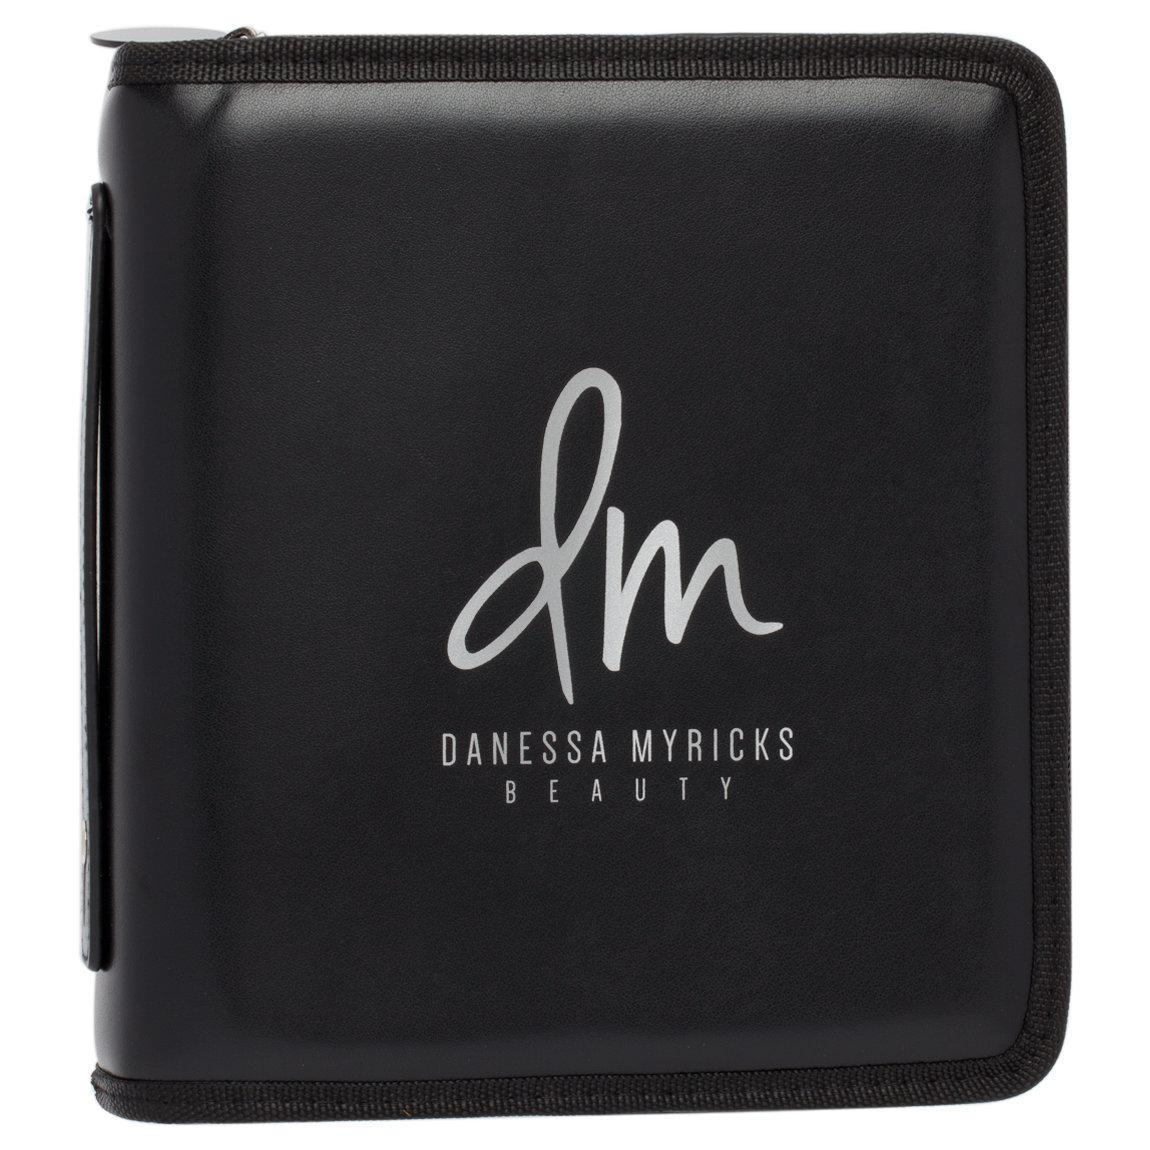 Danessa Myricks Beauty Lippibook alternative view 1 - product swatch.